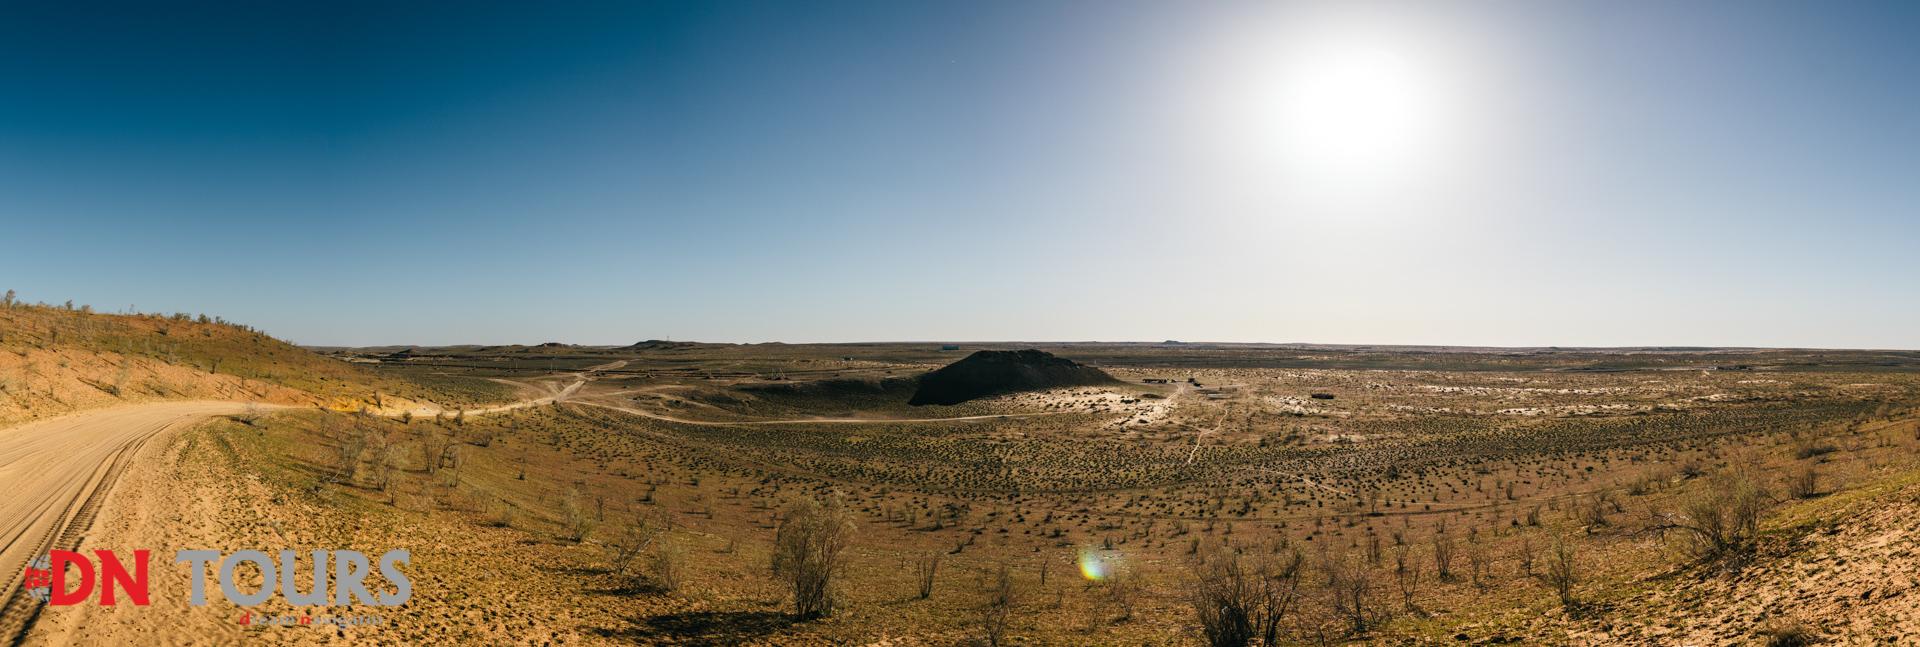 Дарваза газовый кратер Туркменистан Врата в Ад